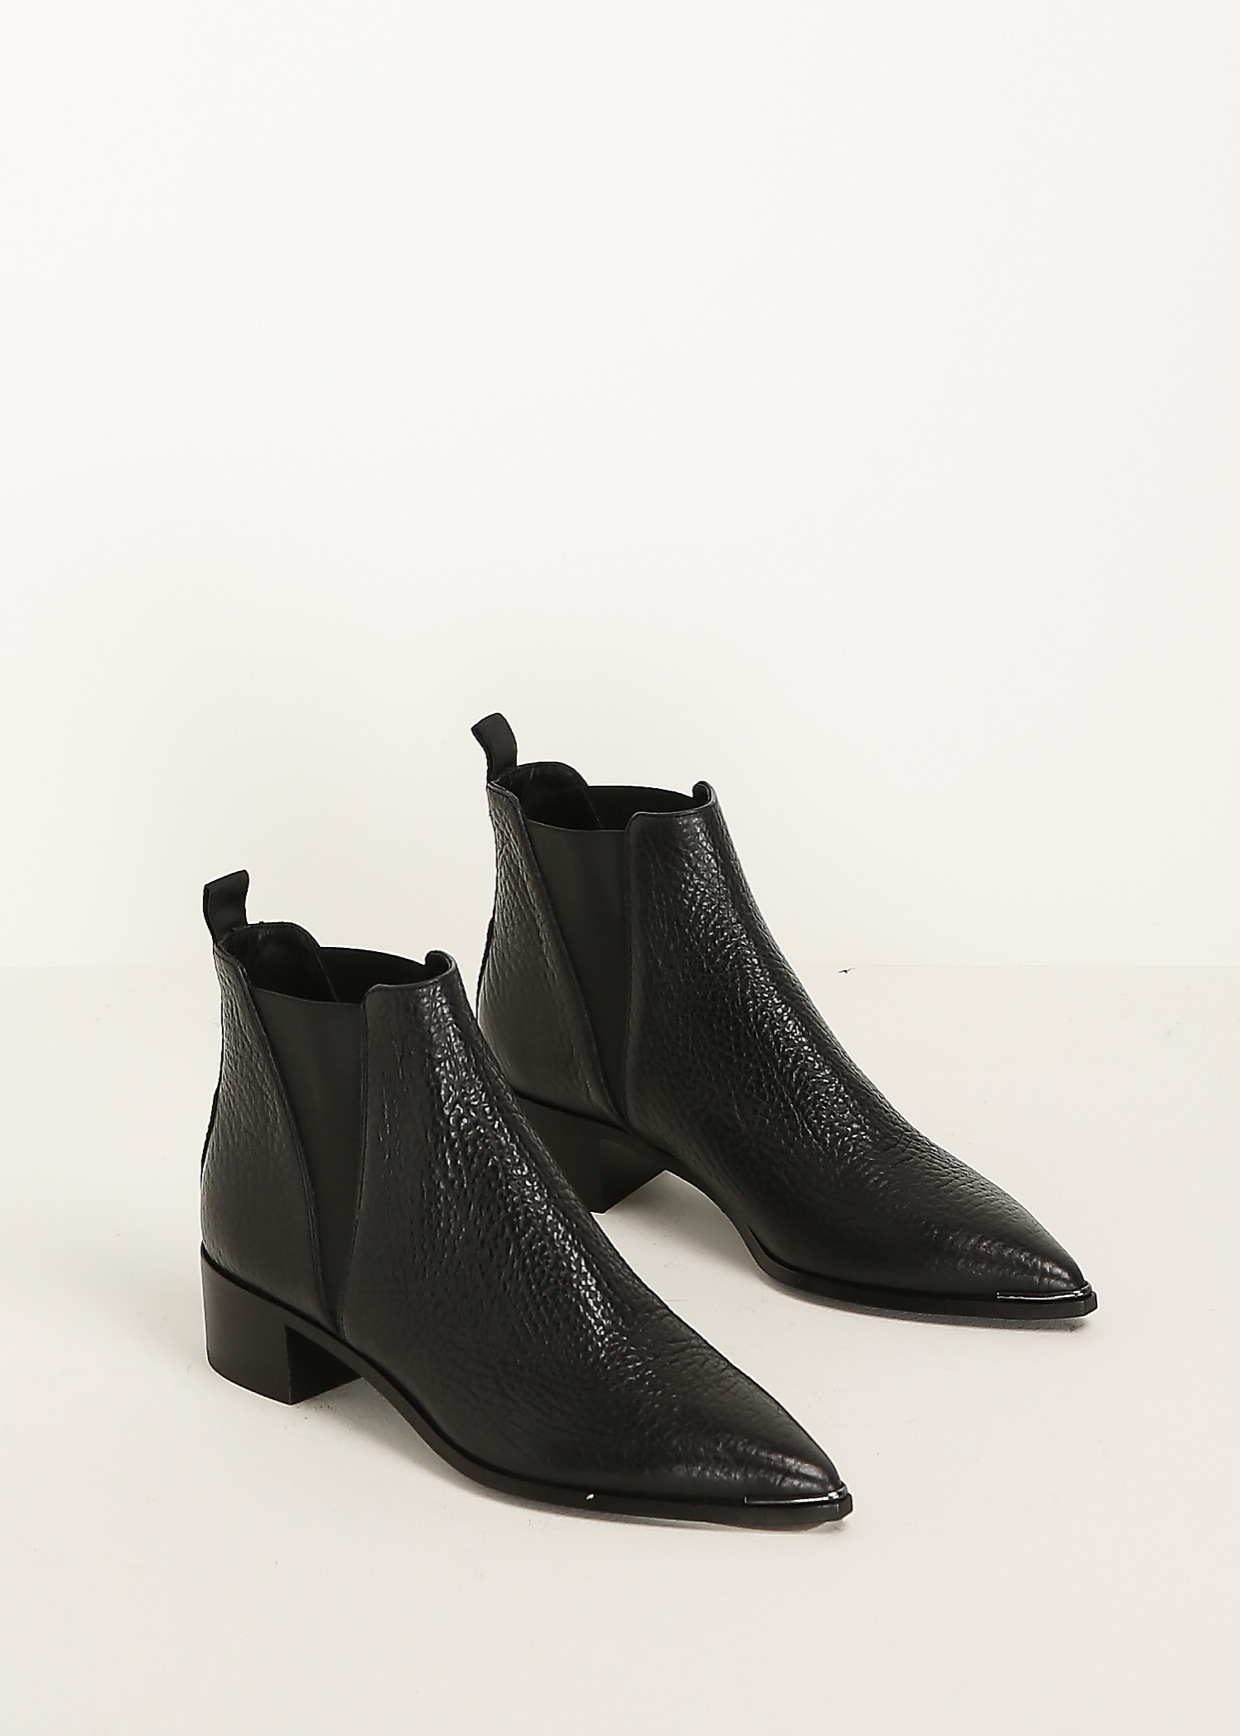 acne studios black jensen grain ankle boot in black lyst. Black Bedroom Furniture Sets. Home Design Ideas